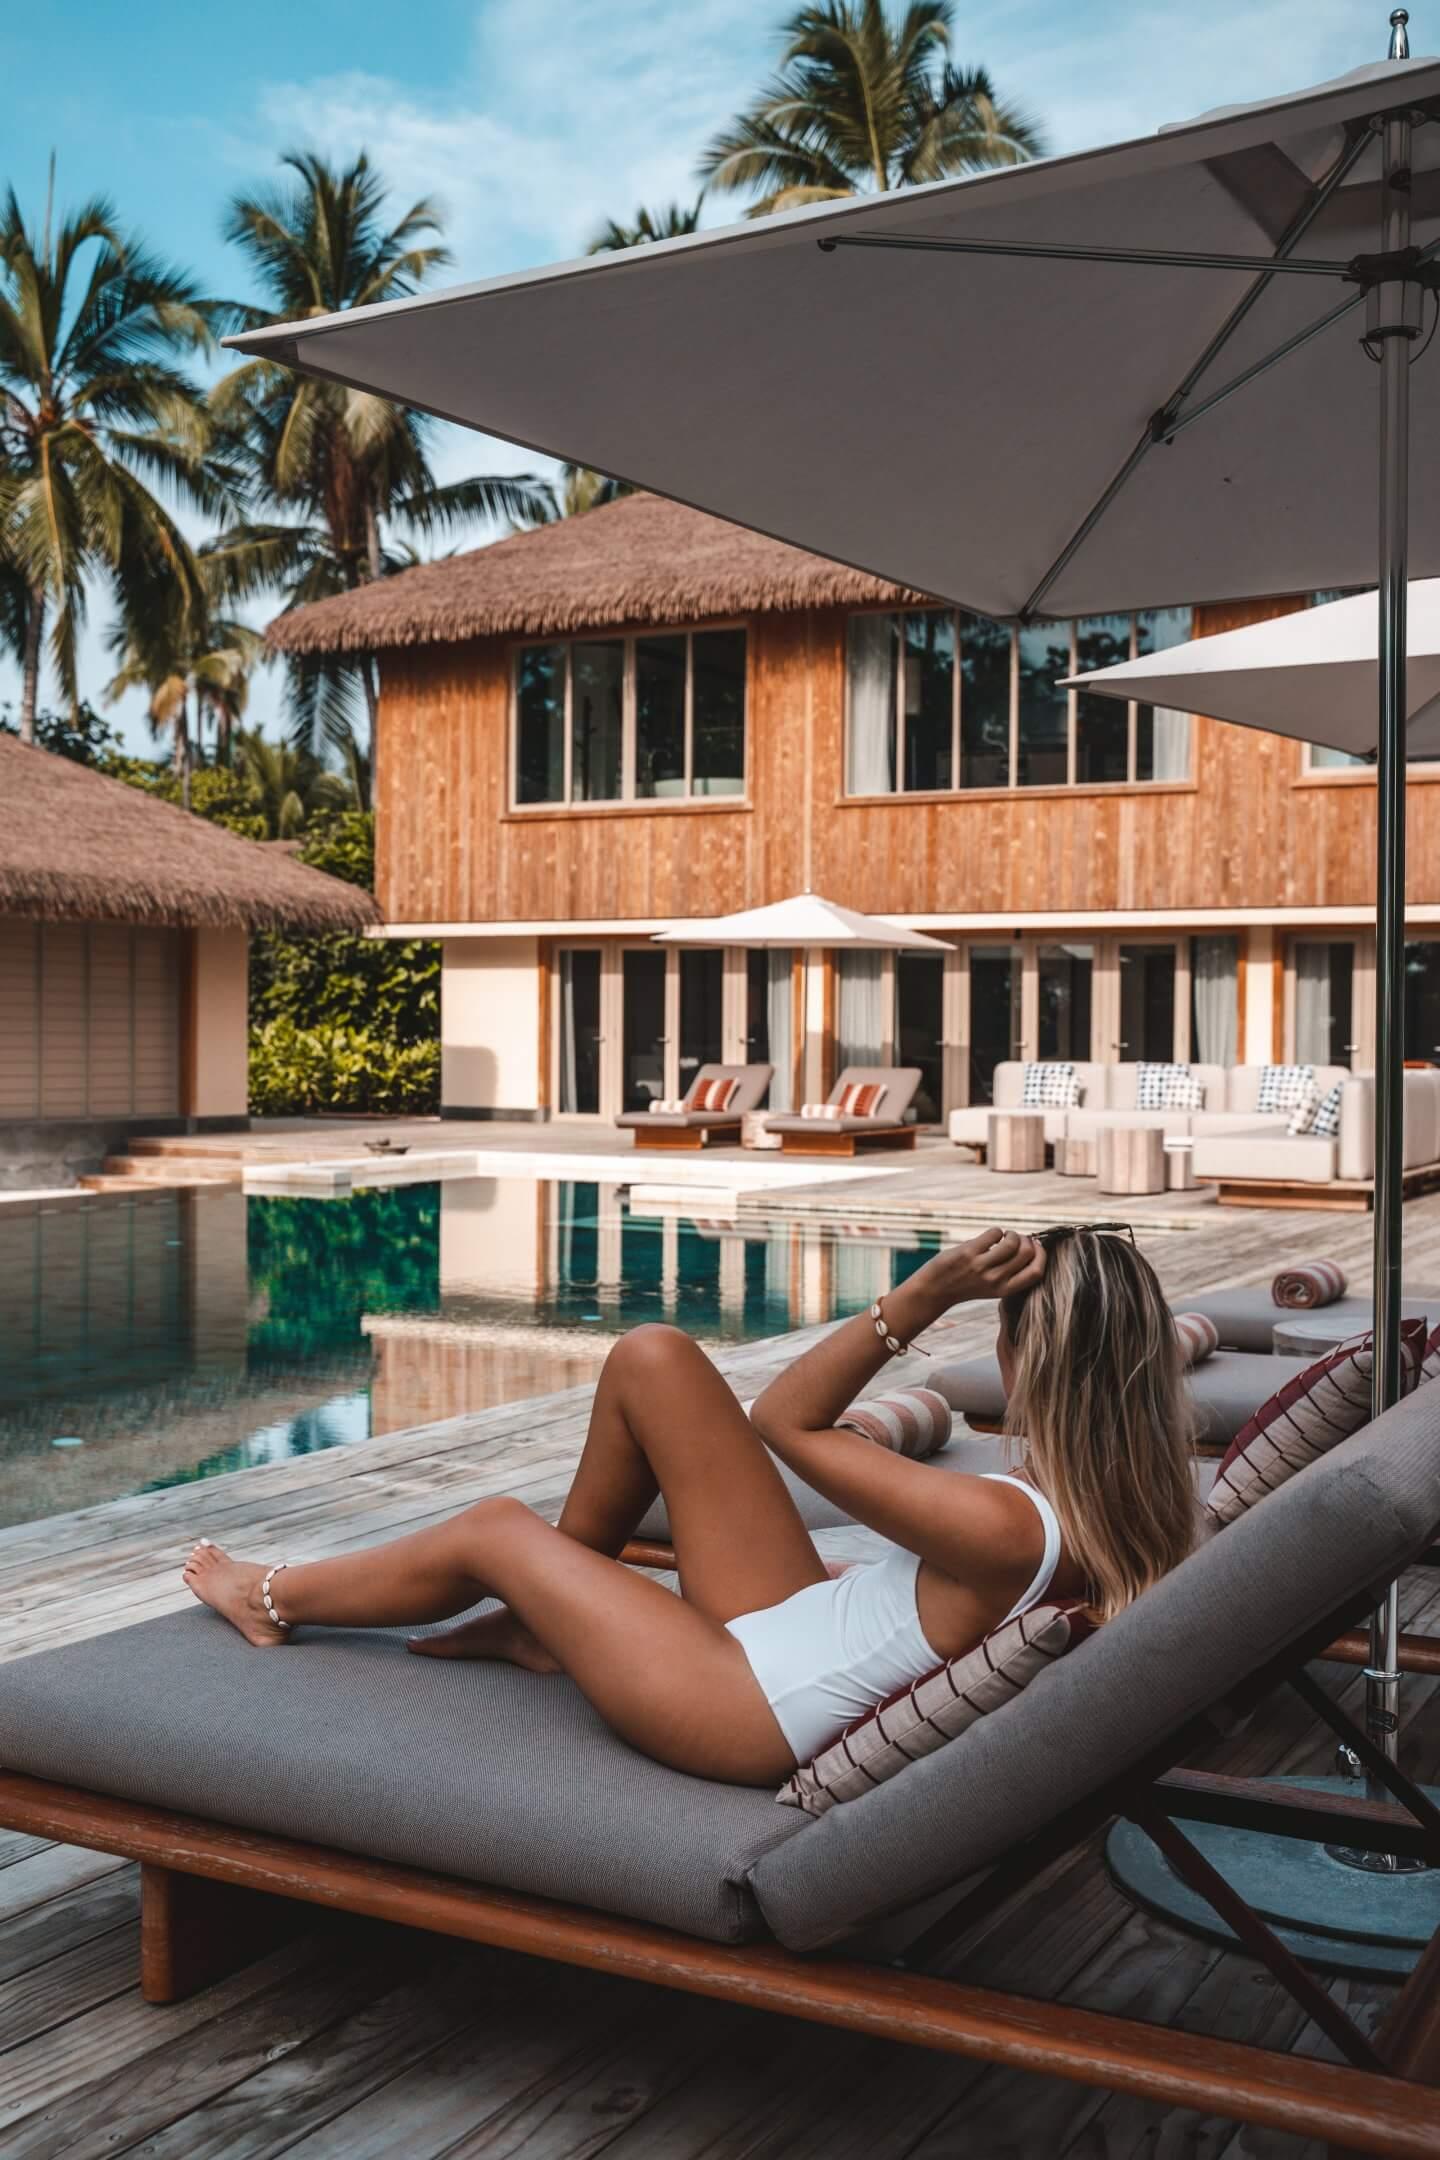 InterContinental Beach Villa - Best Maldives Resort on Points